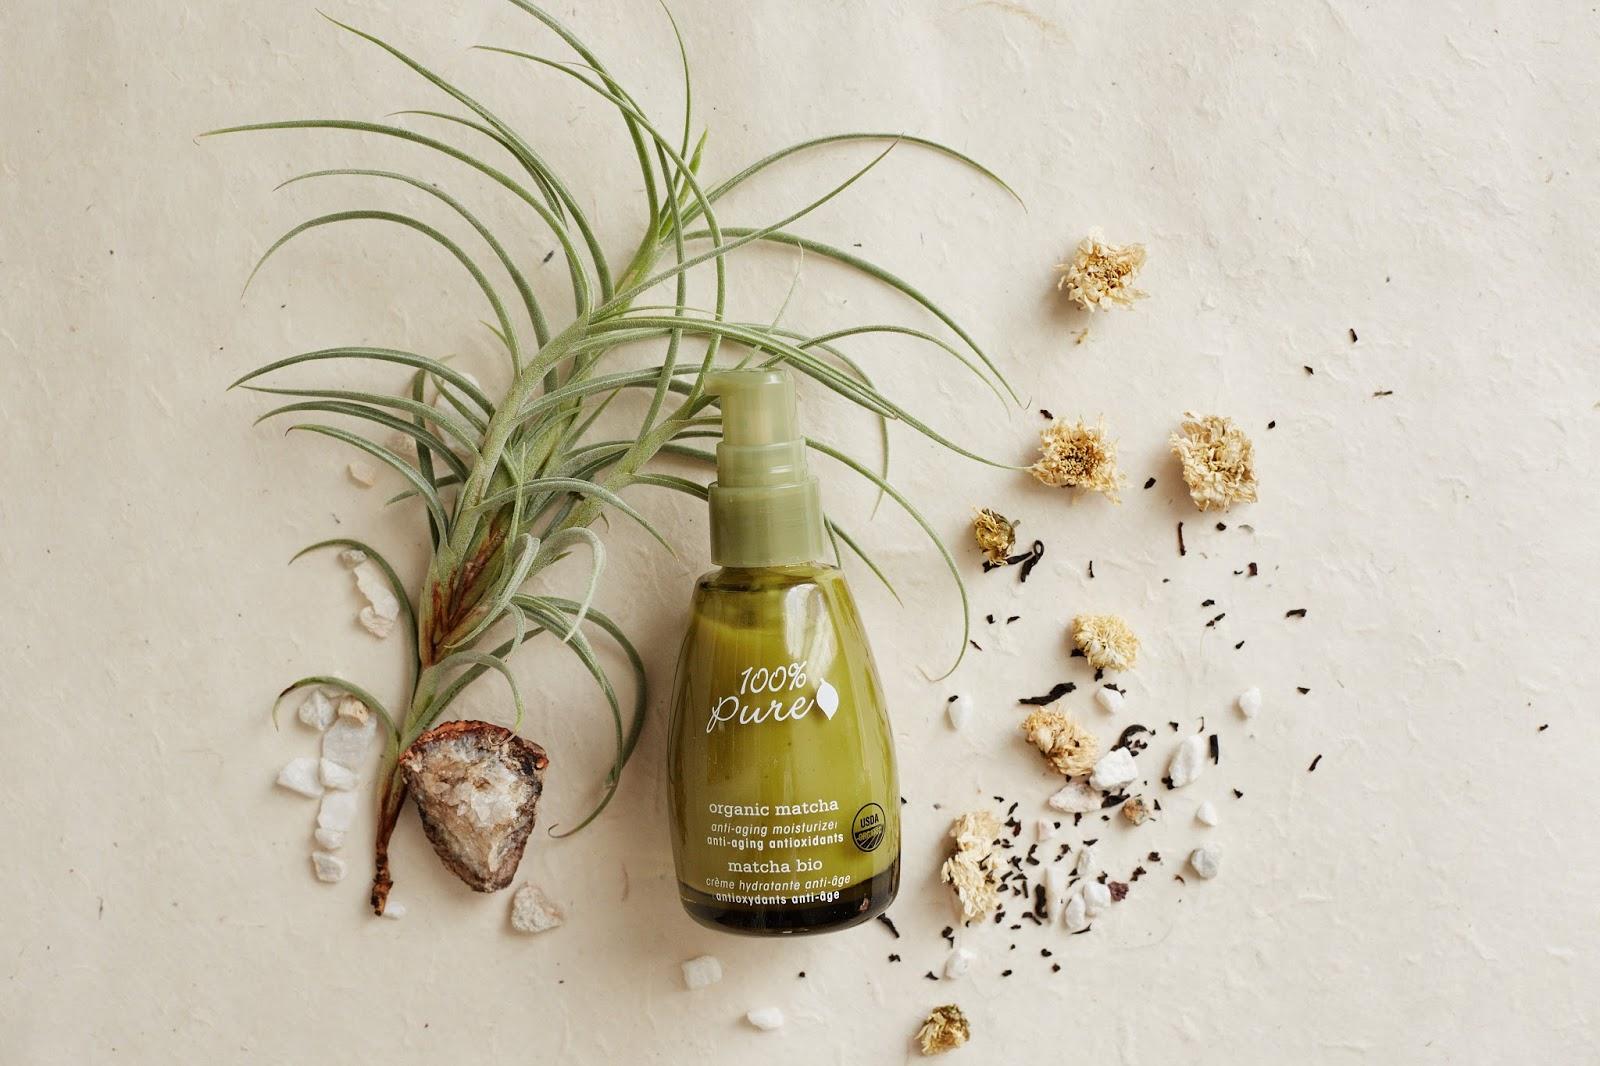 100 Percent Pure Organic Matcha Moisturizer Review nontoxic natural skin care brand hellolindasau